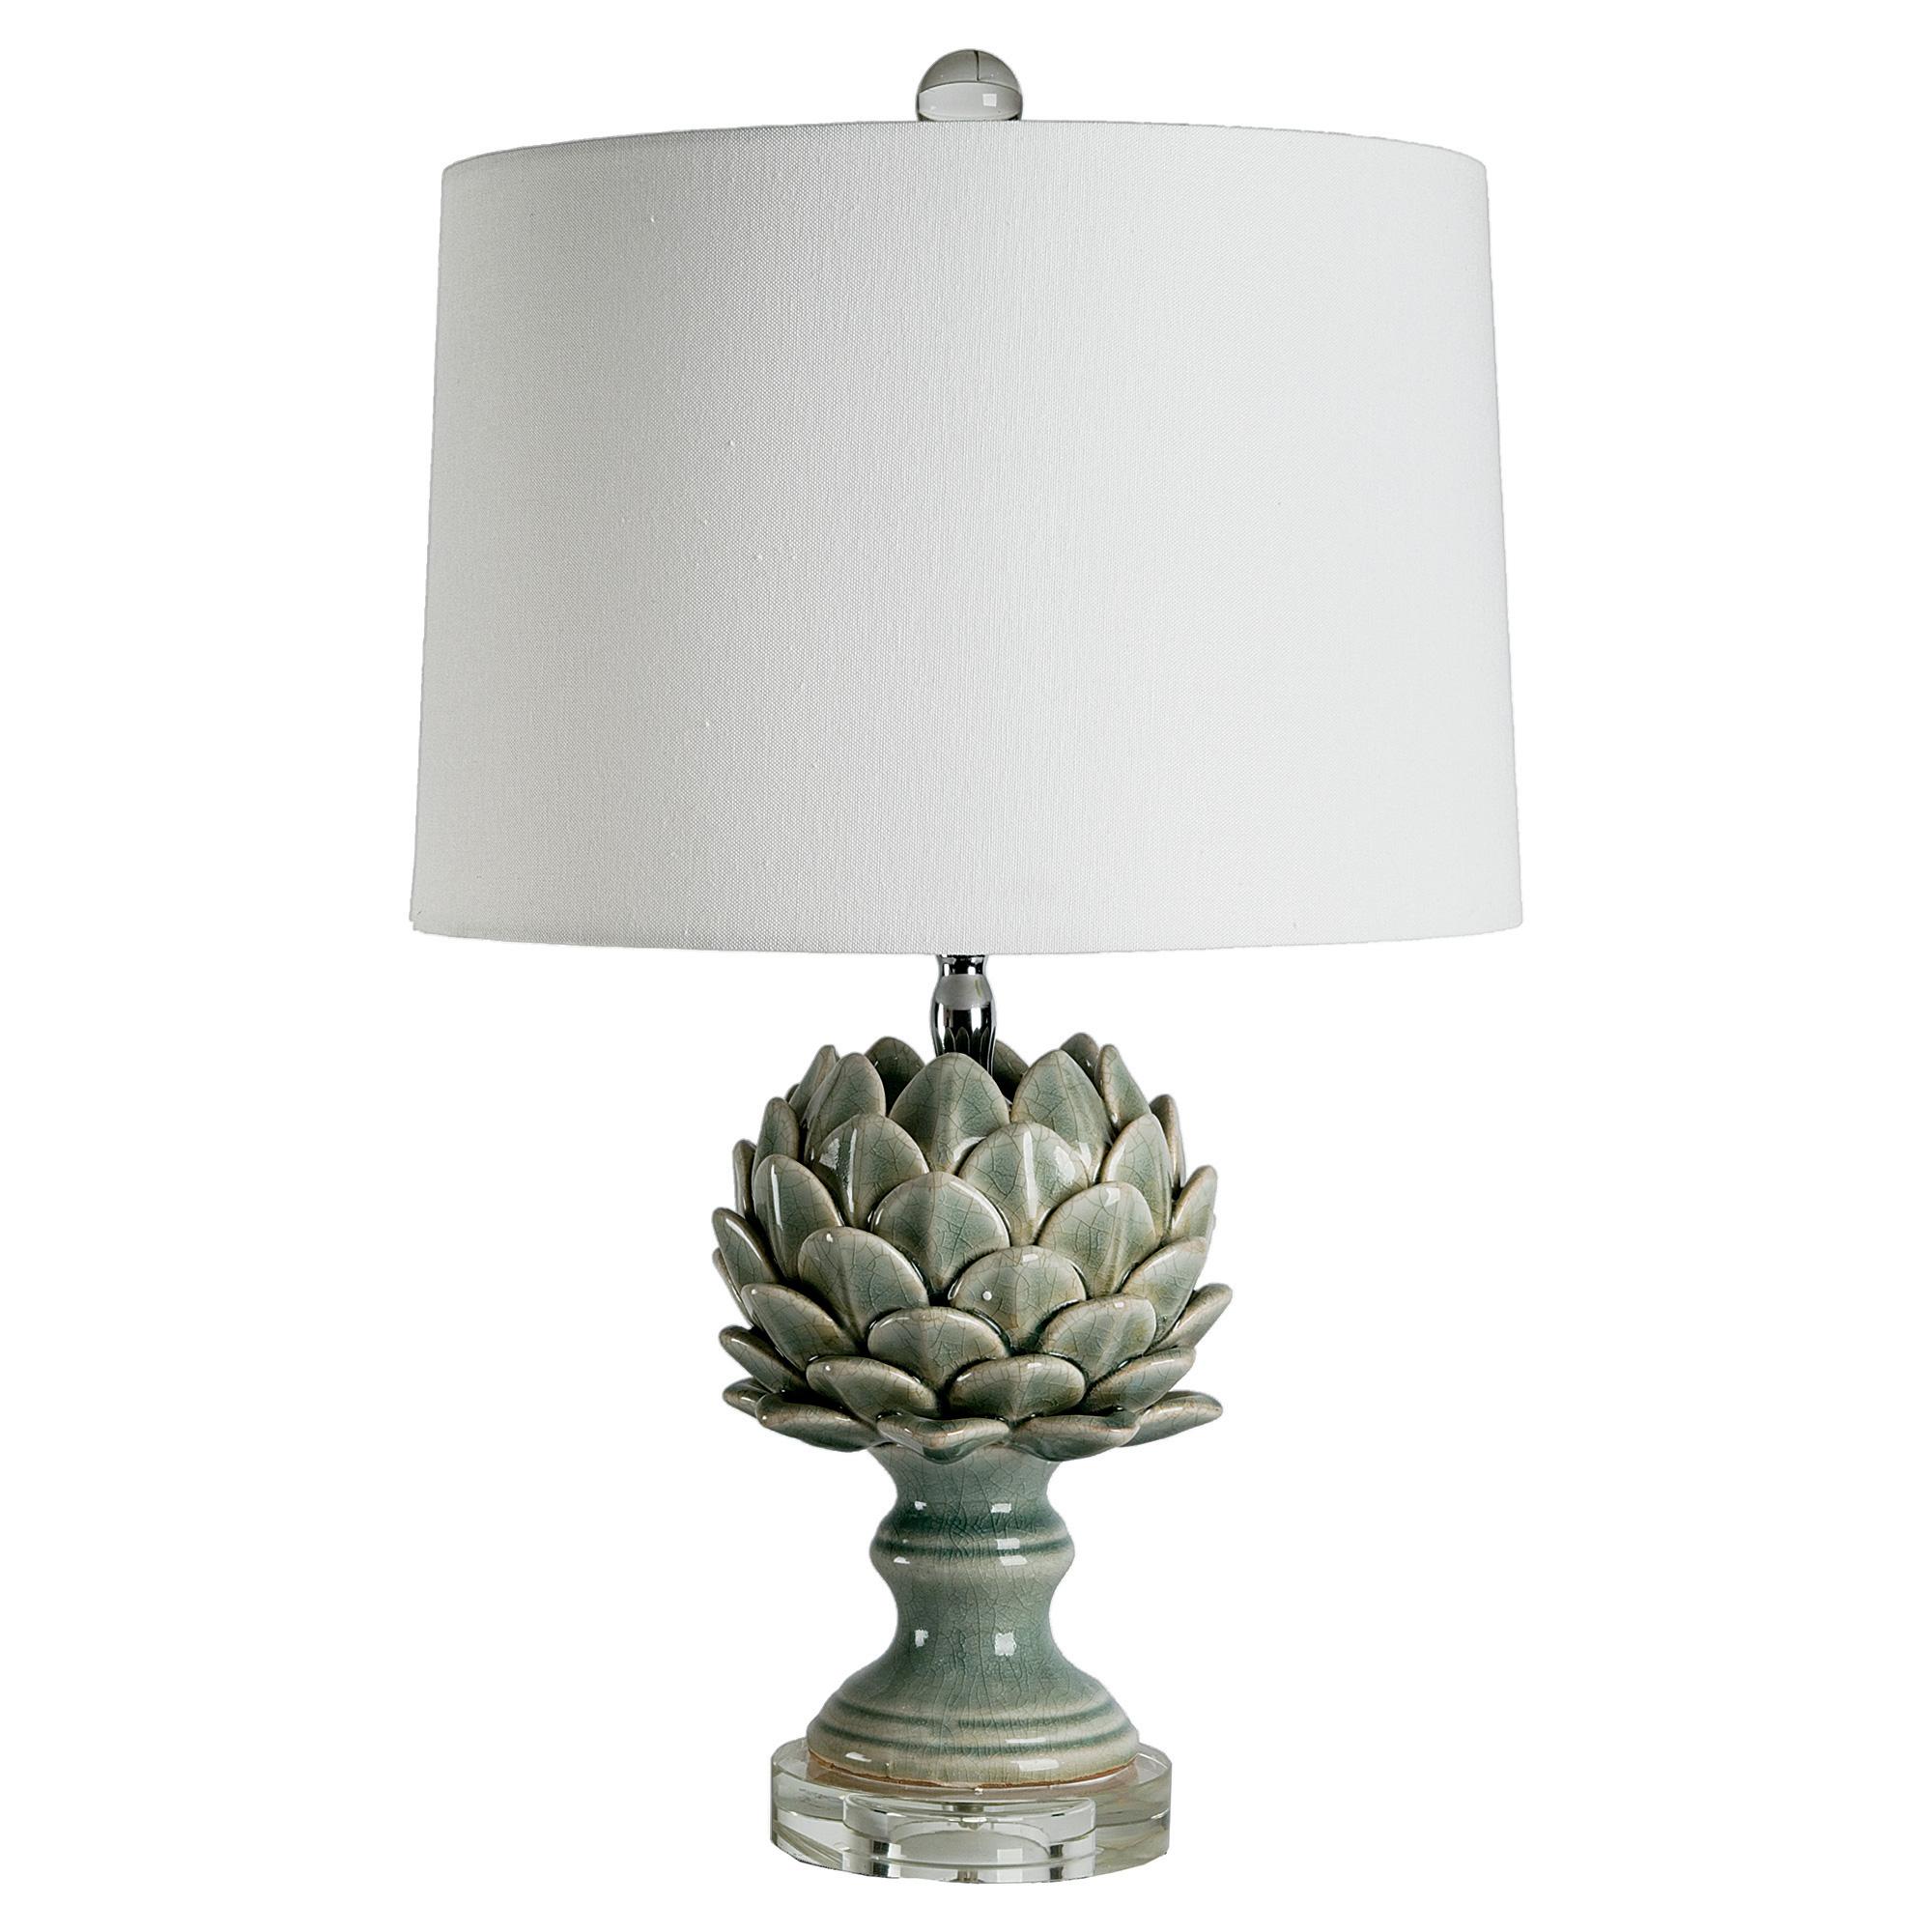 Fiesole Global Modern Green Leaf Artichoke Table Lamp